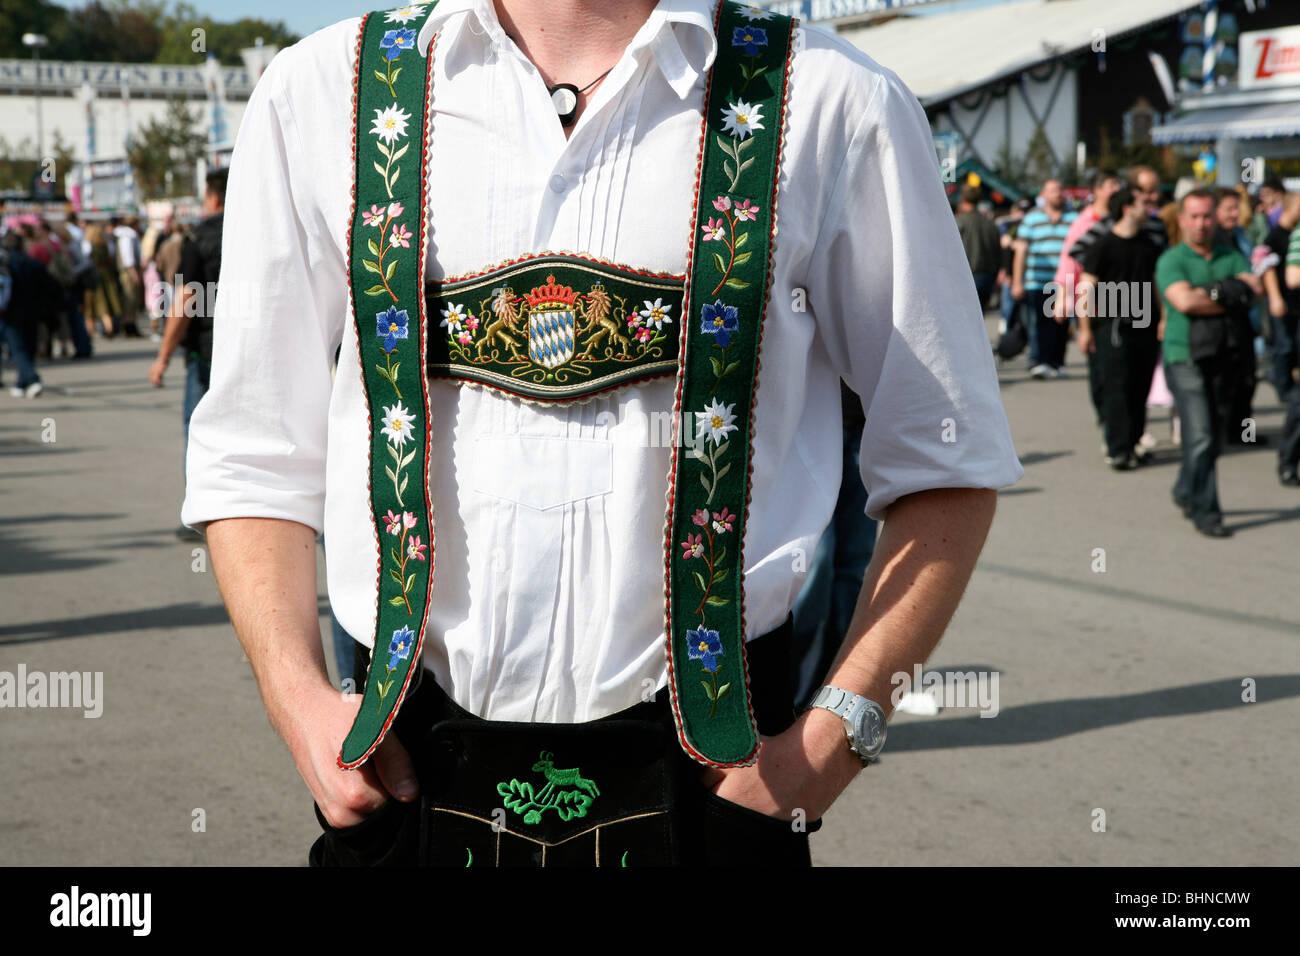 Bavarian traditional costume at Oktoberfest - Stock Image